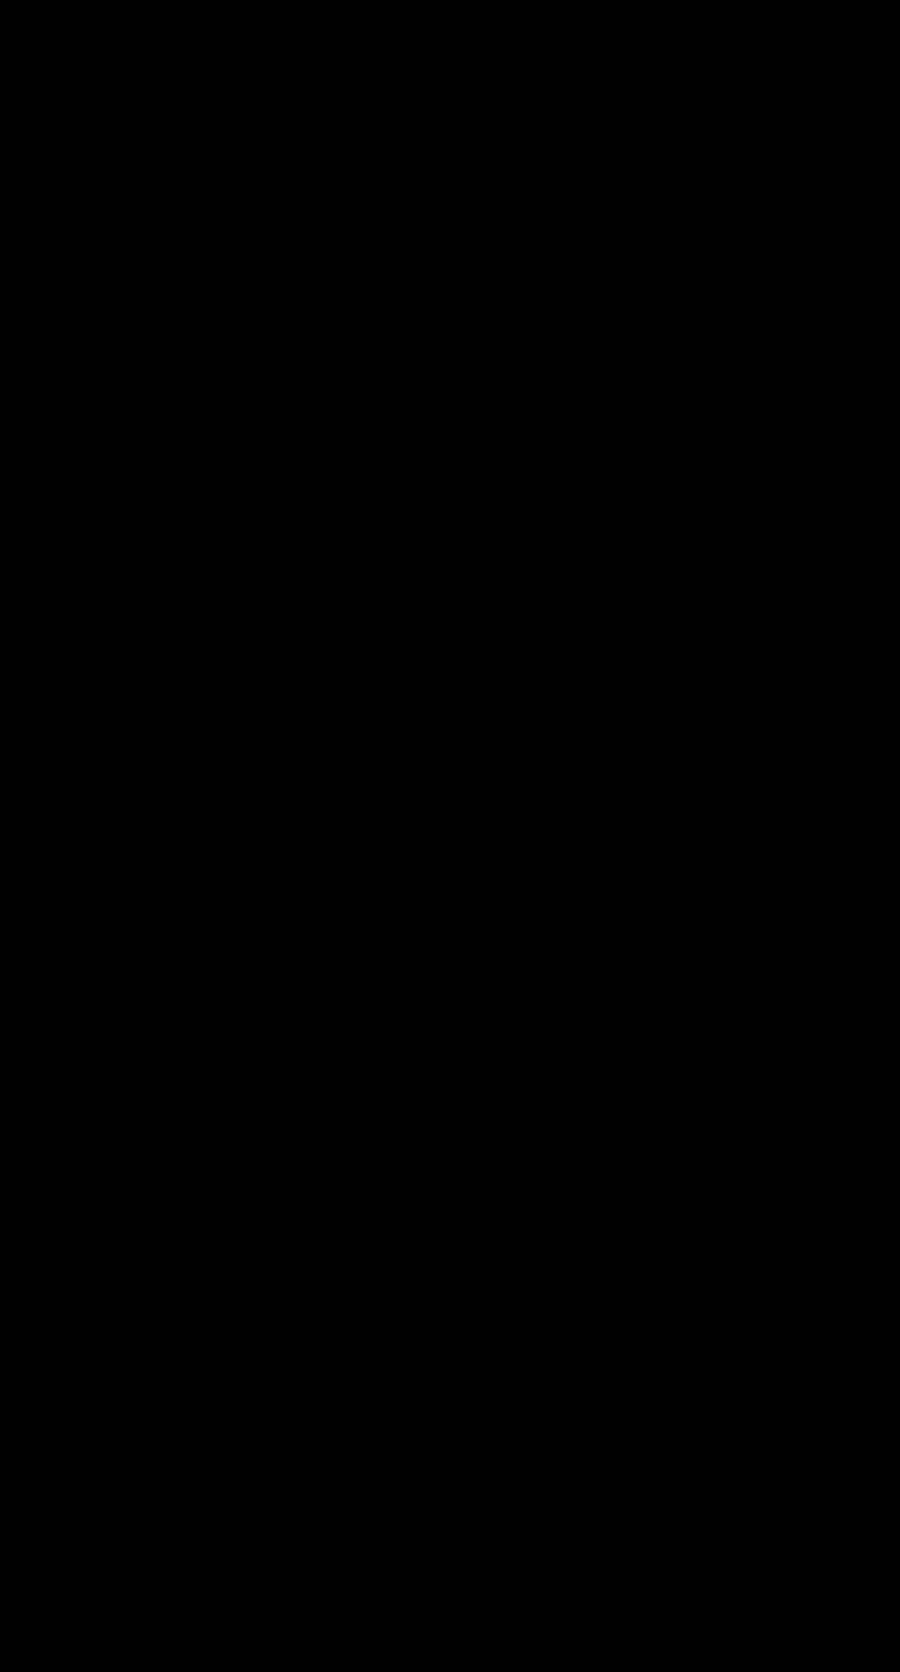 Juvia Lineart : Juvia lineart by bleach fairy on deviantart